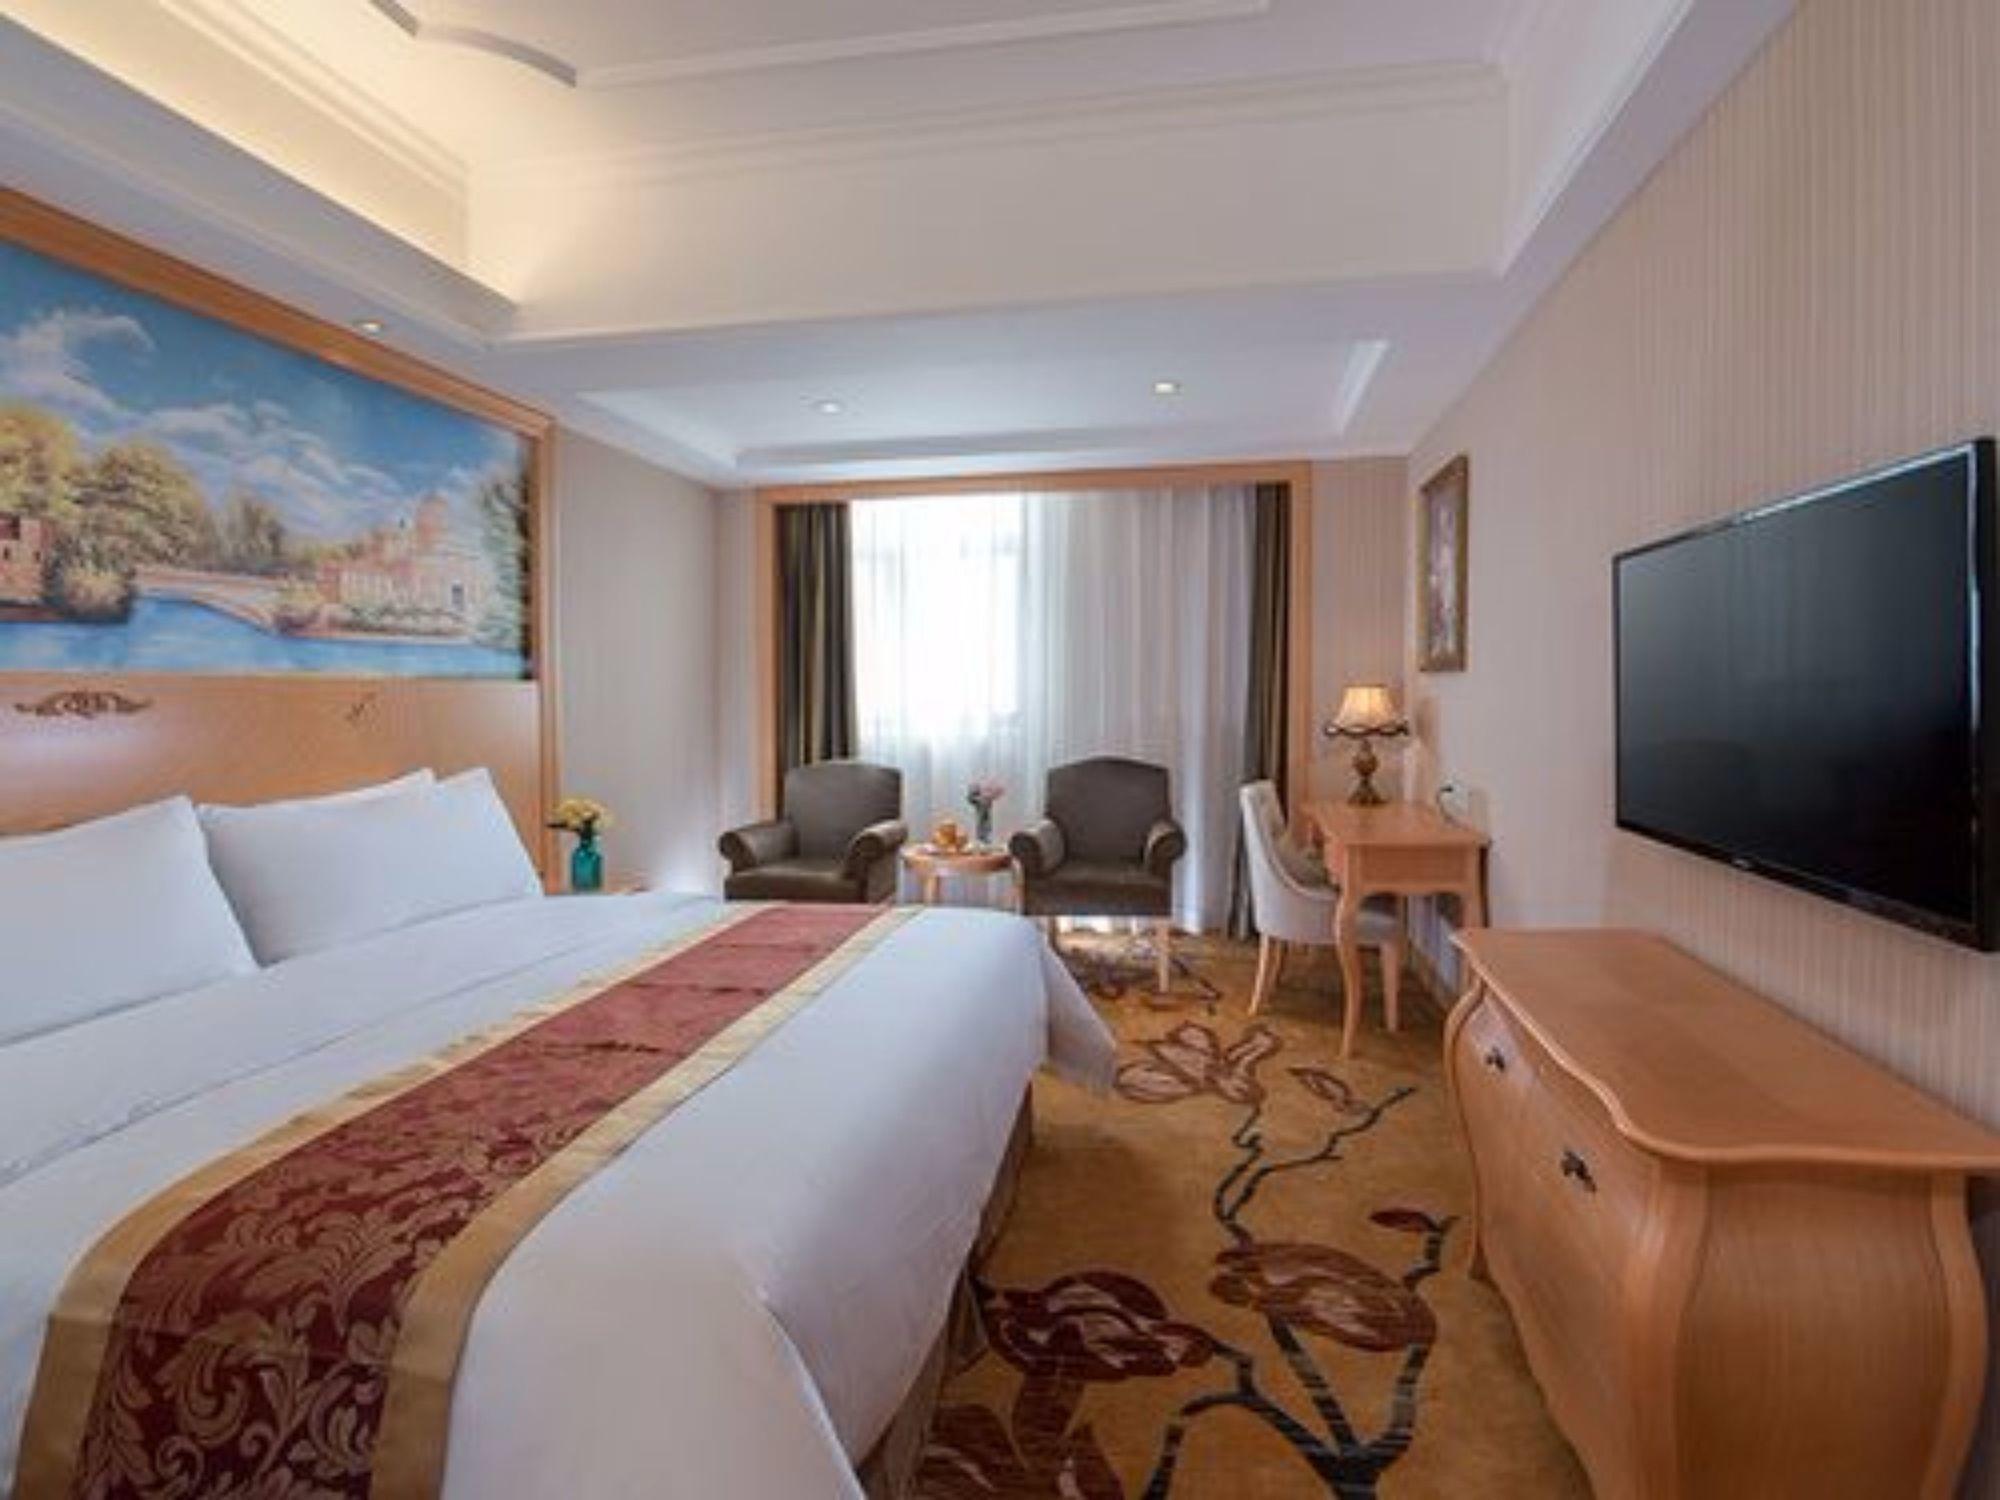 Vienna hotel lee moma store